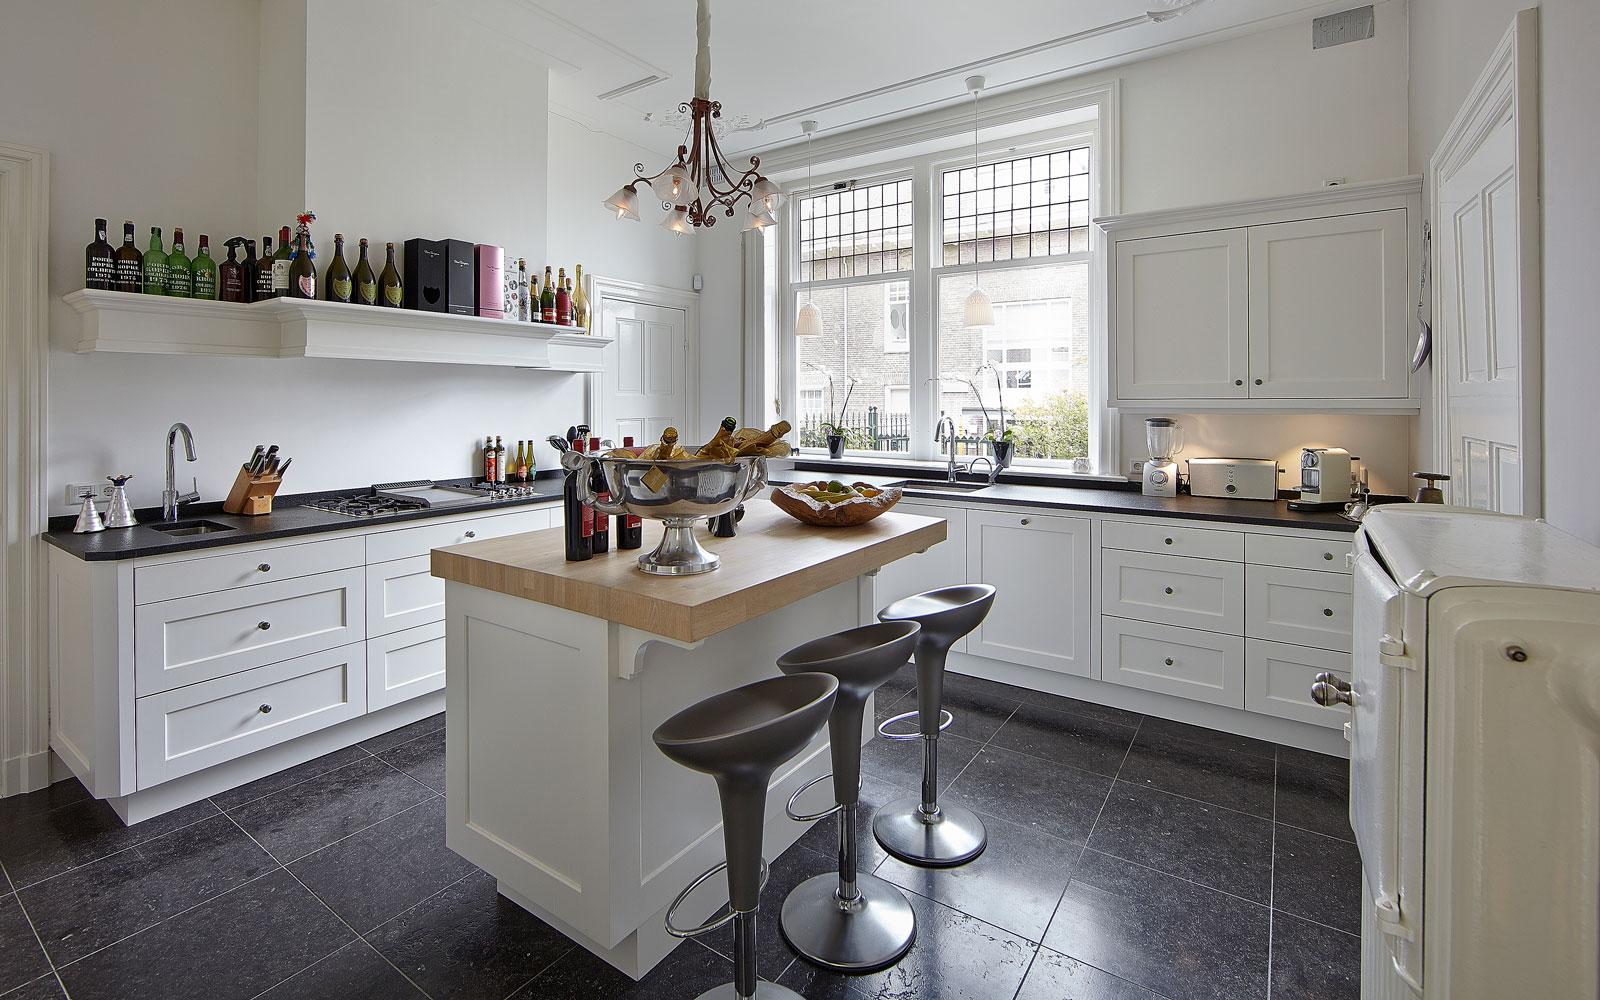 The Art of Living, Exclusief wonen, Keuken Vloer Hasper Natuursteen, keuken, design, wit, villa, tegelvloer, keukeneiland, keukenapparatuur